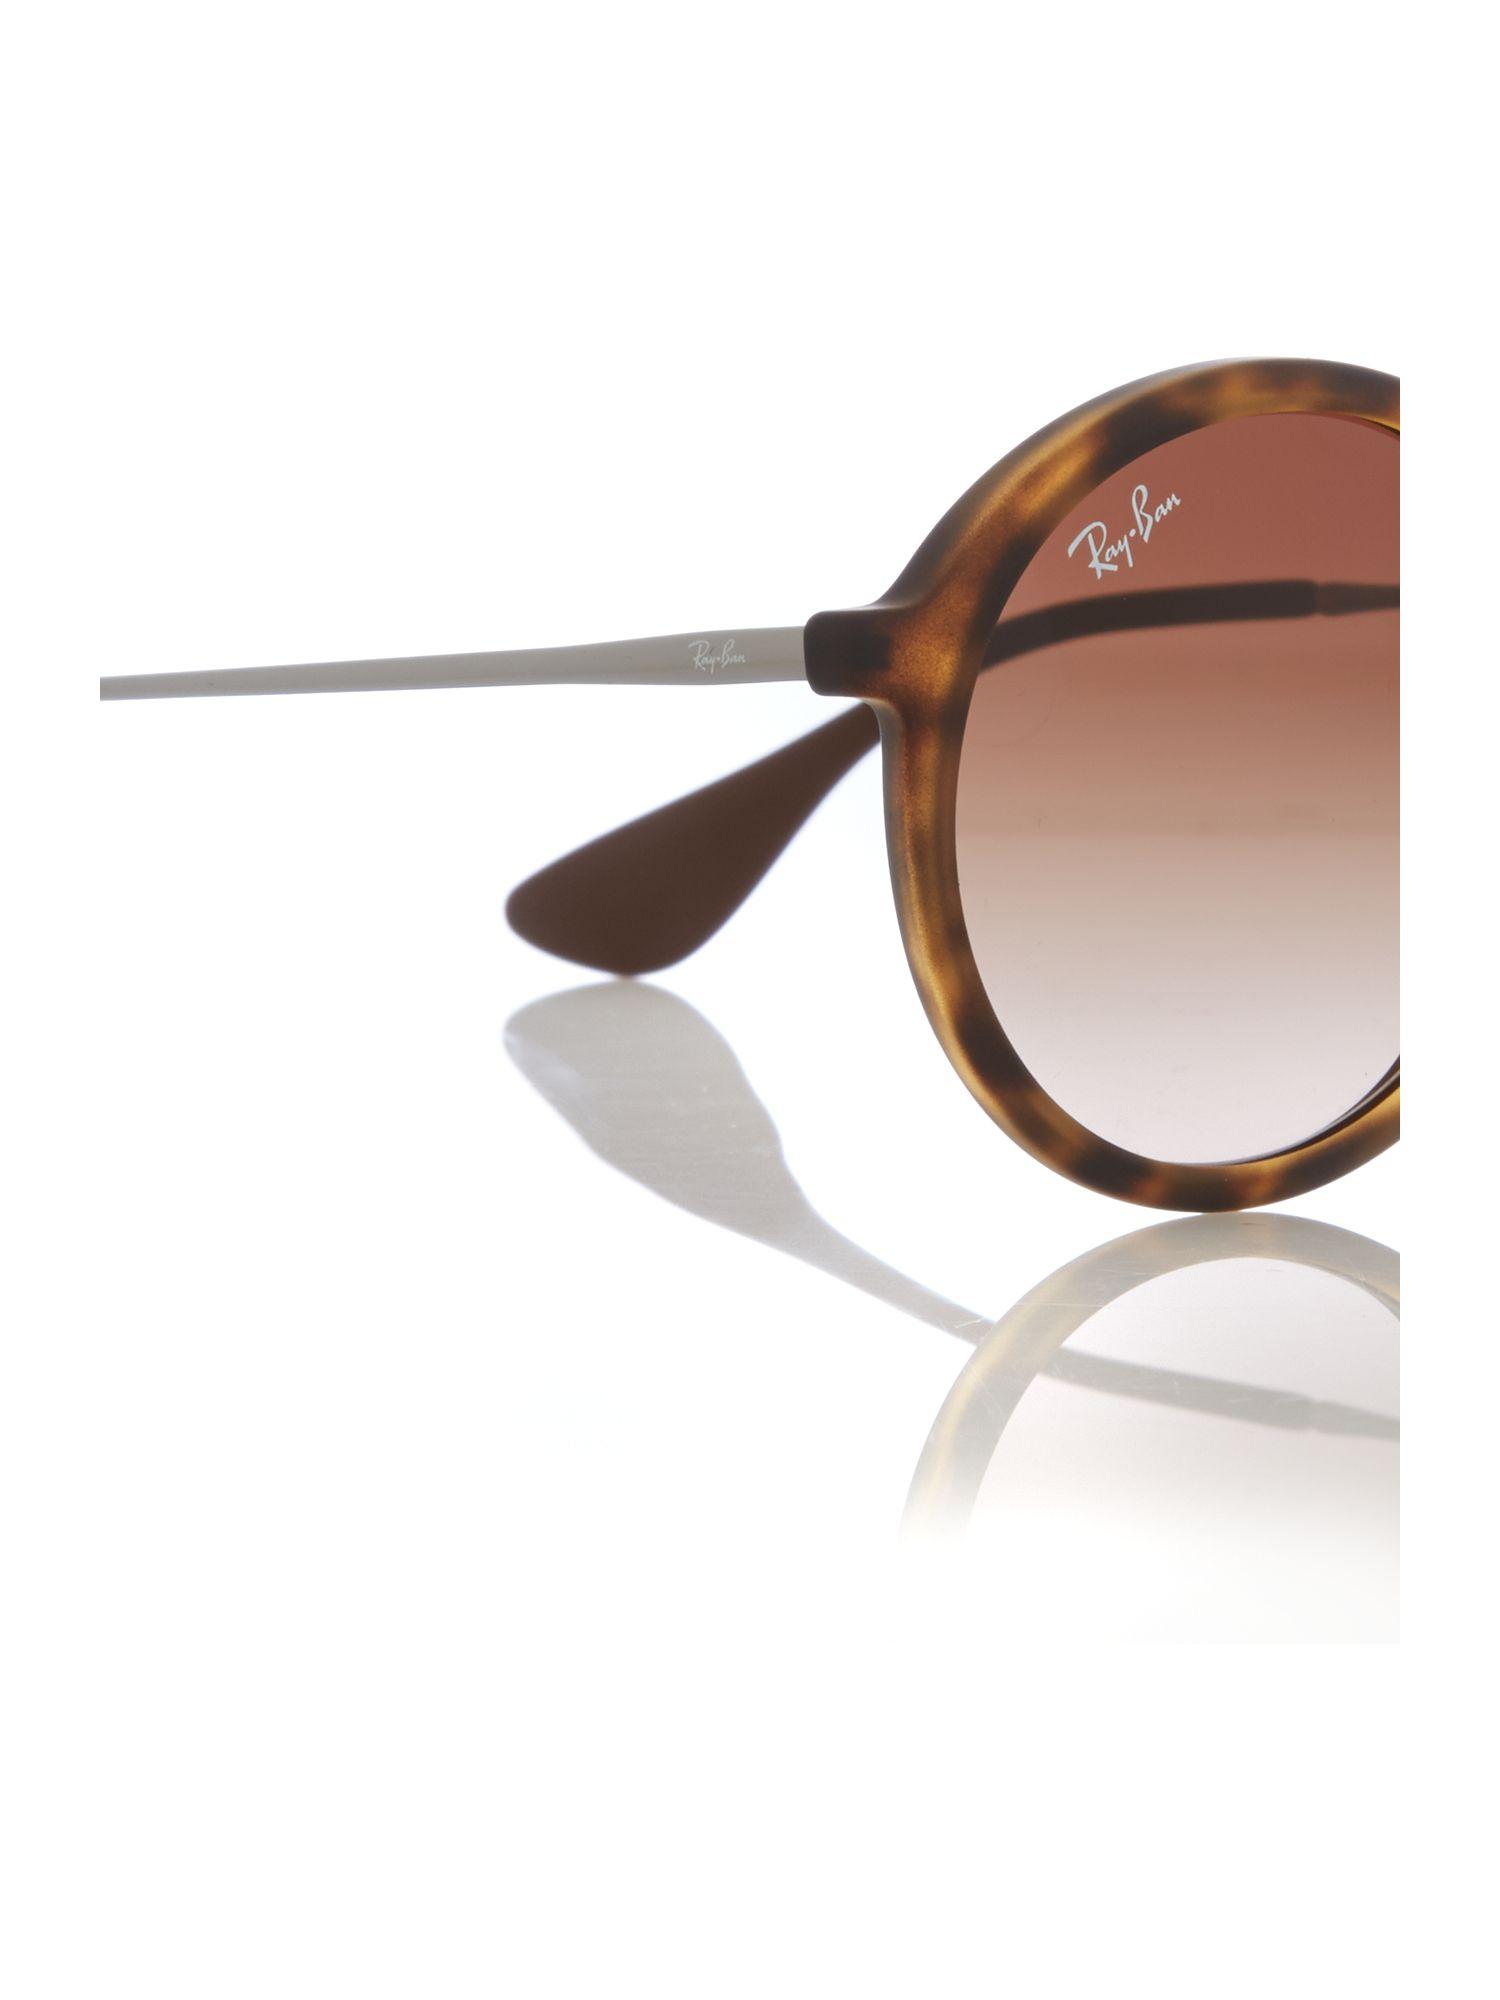 bde81ac13aa Ray Ban Round Sunglasses Sizes « Heritage Malta